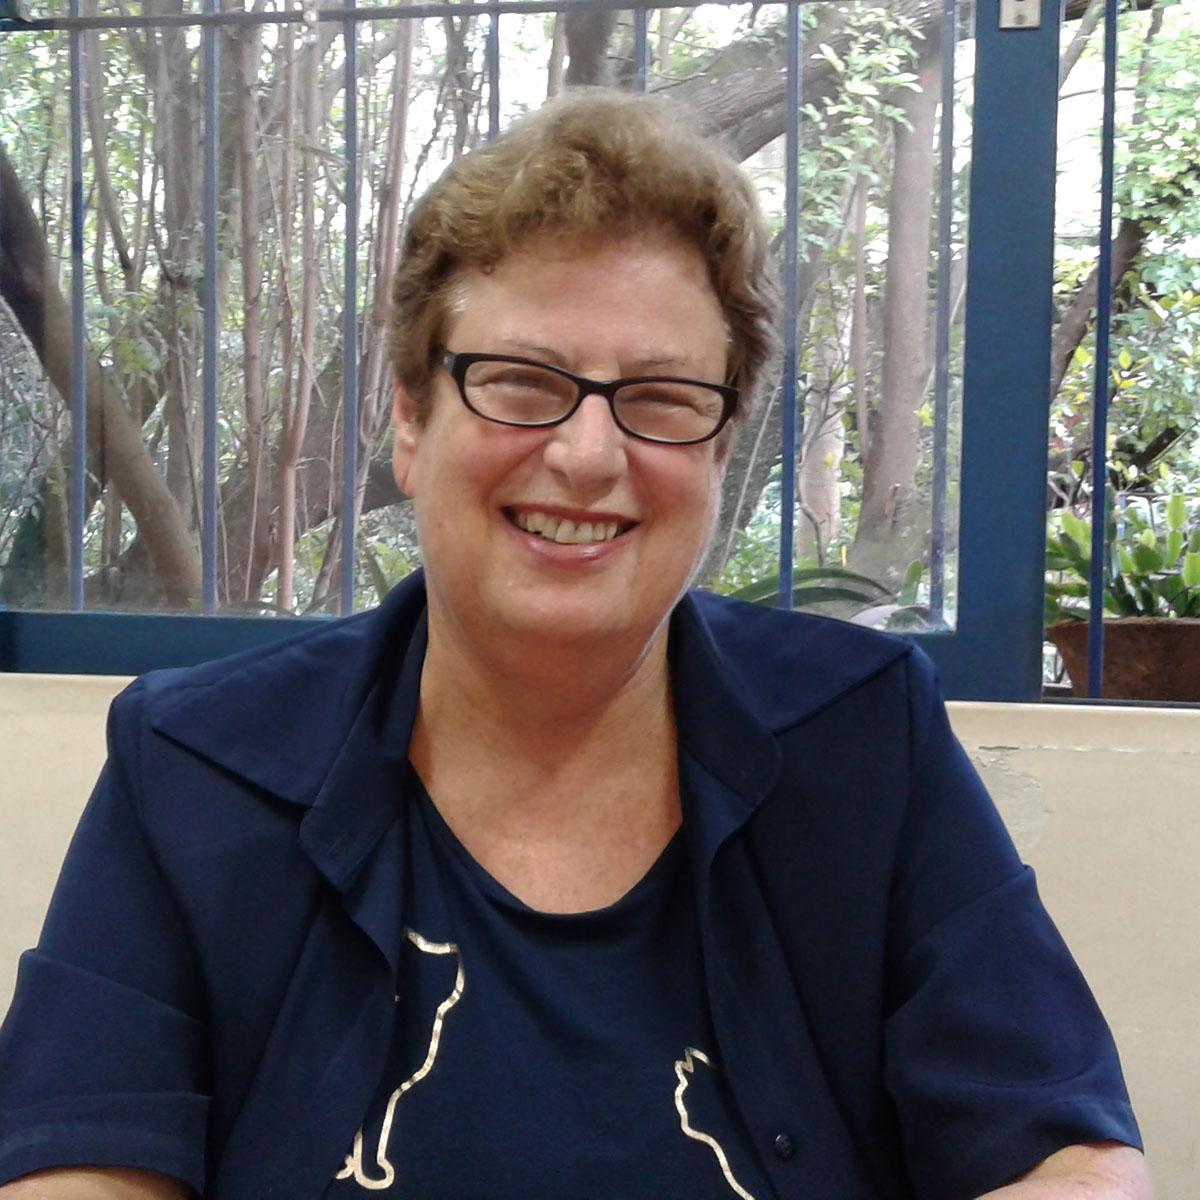 Dra. Maria Julia Kovács